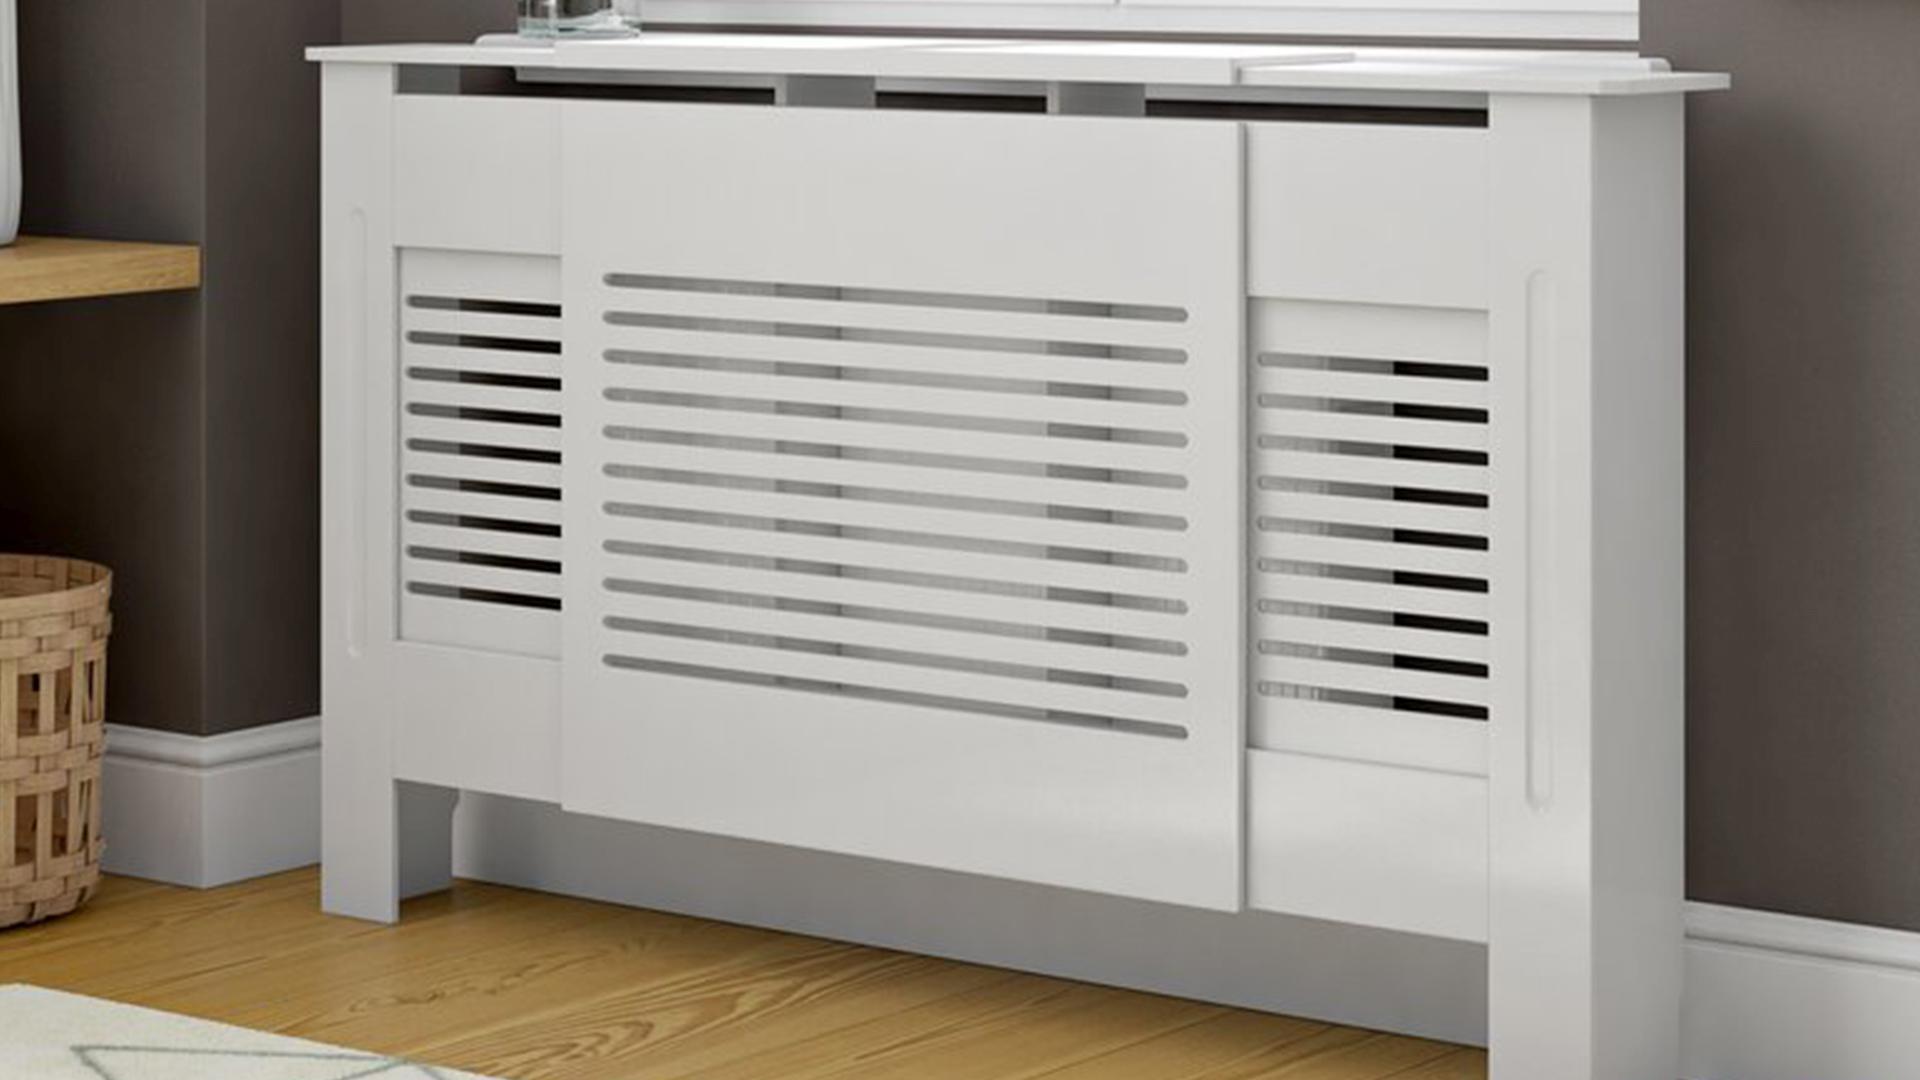 category-Cache-radiateur